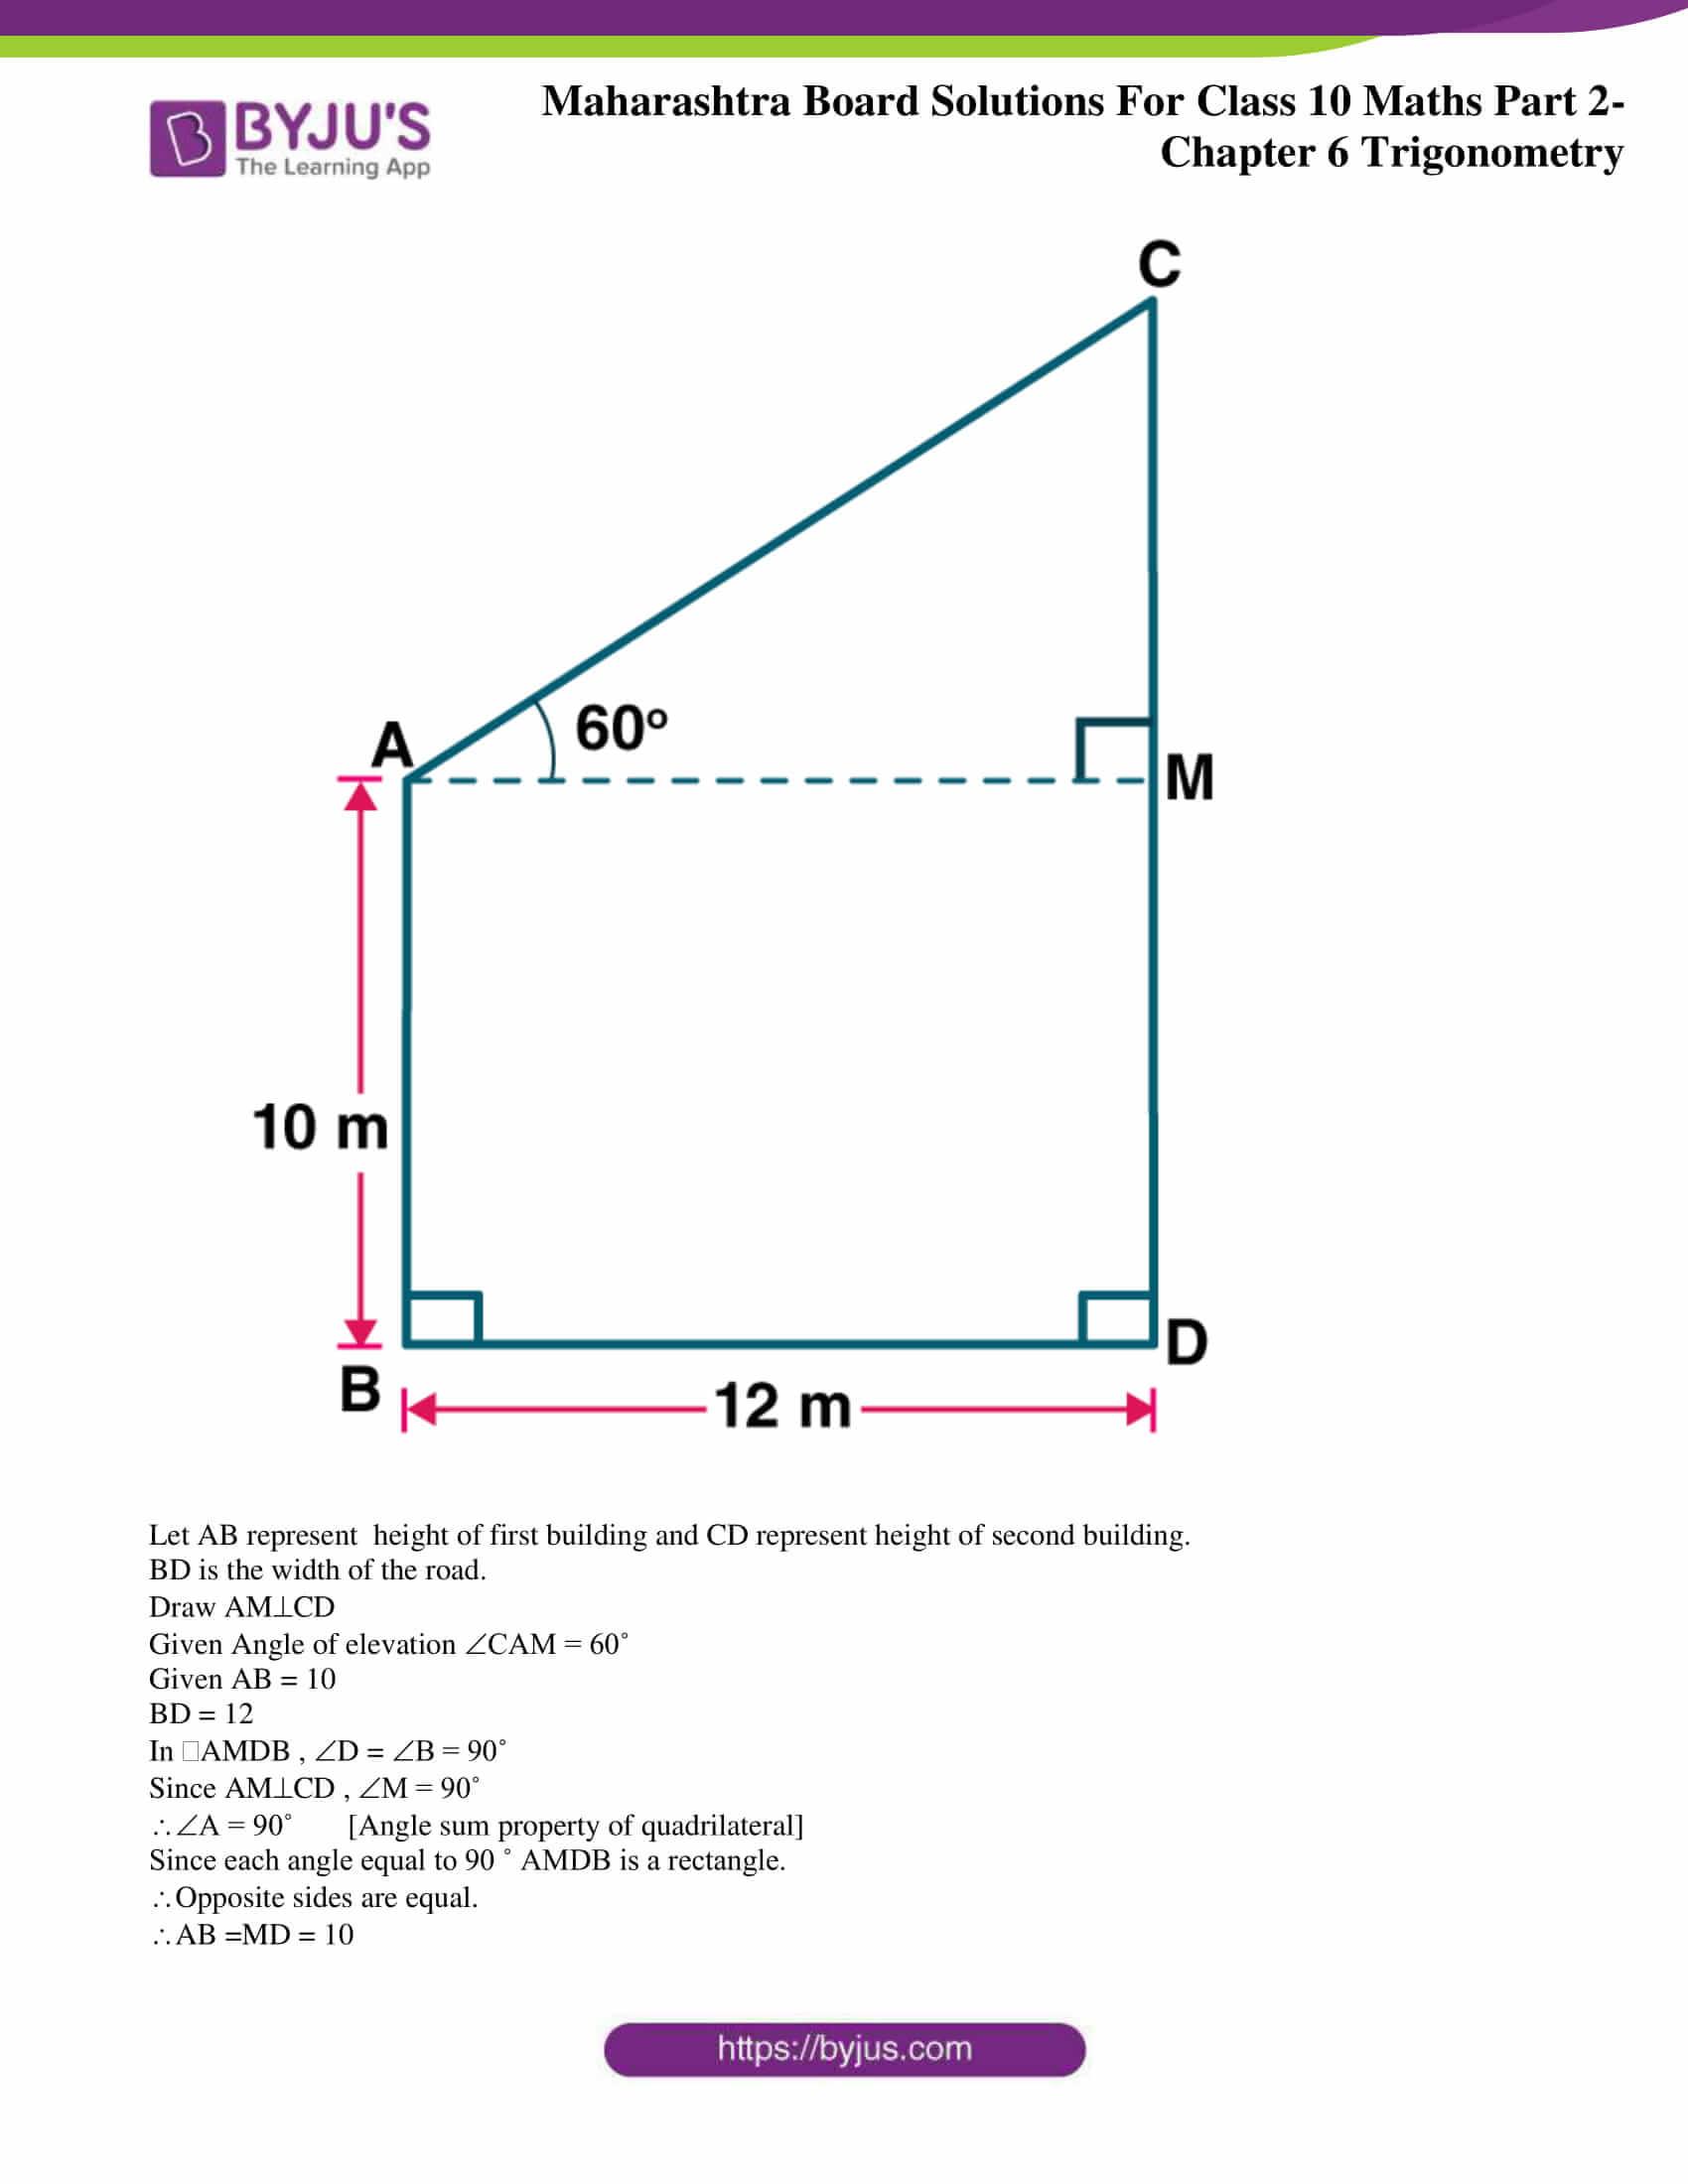 msbshse sol class 10 maths part 2 chapter 6 06